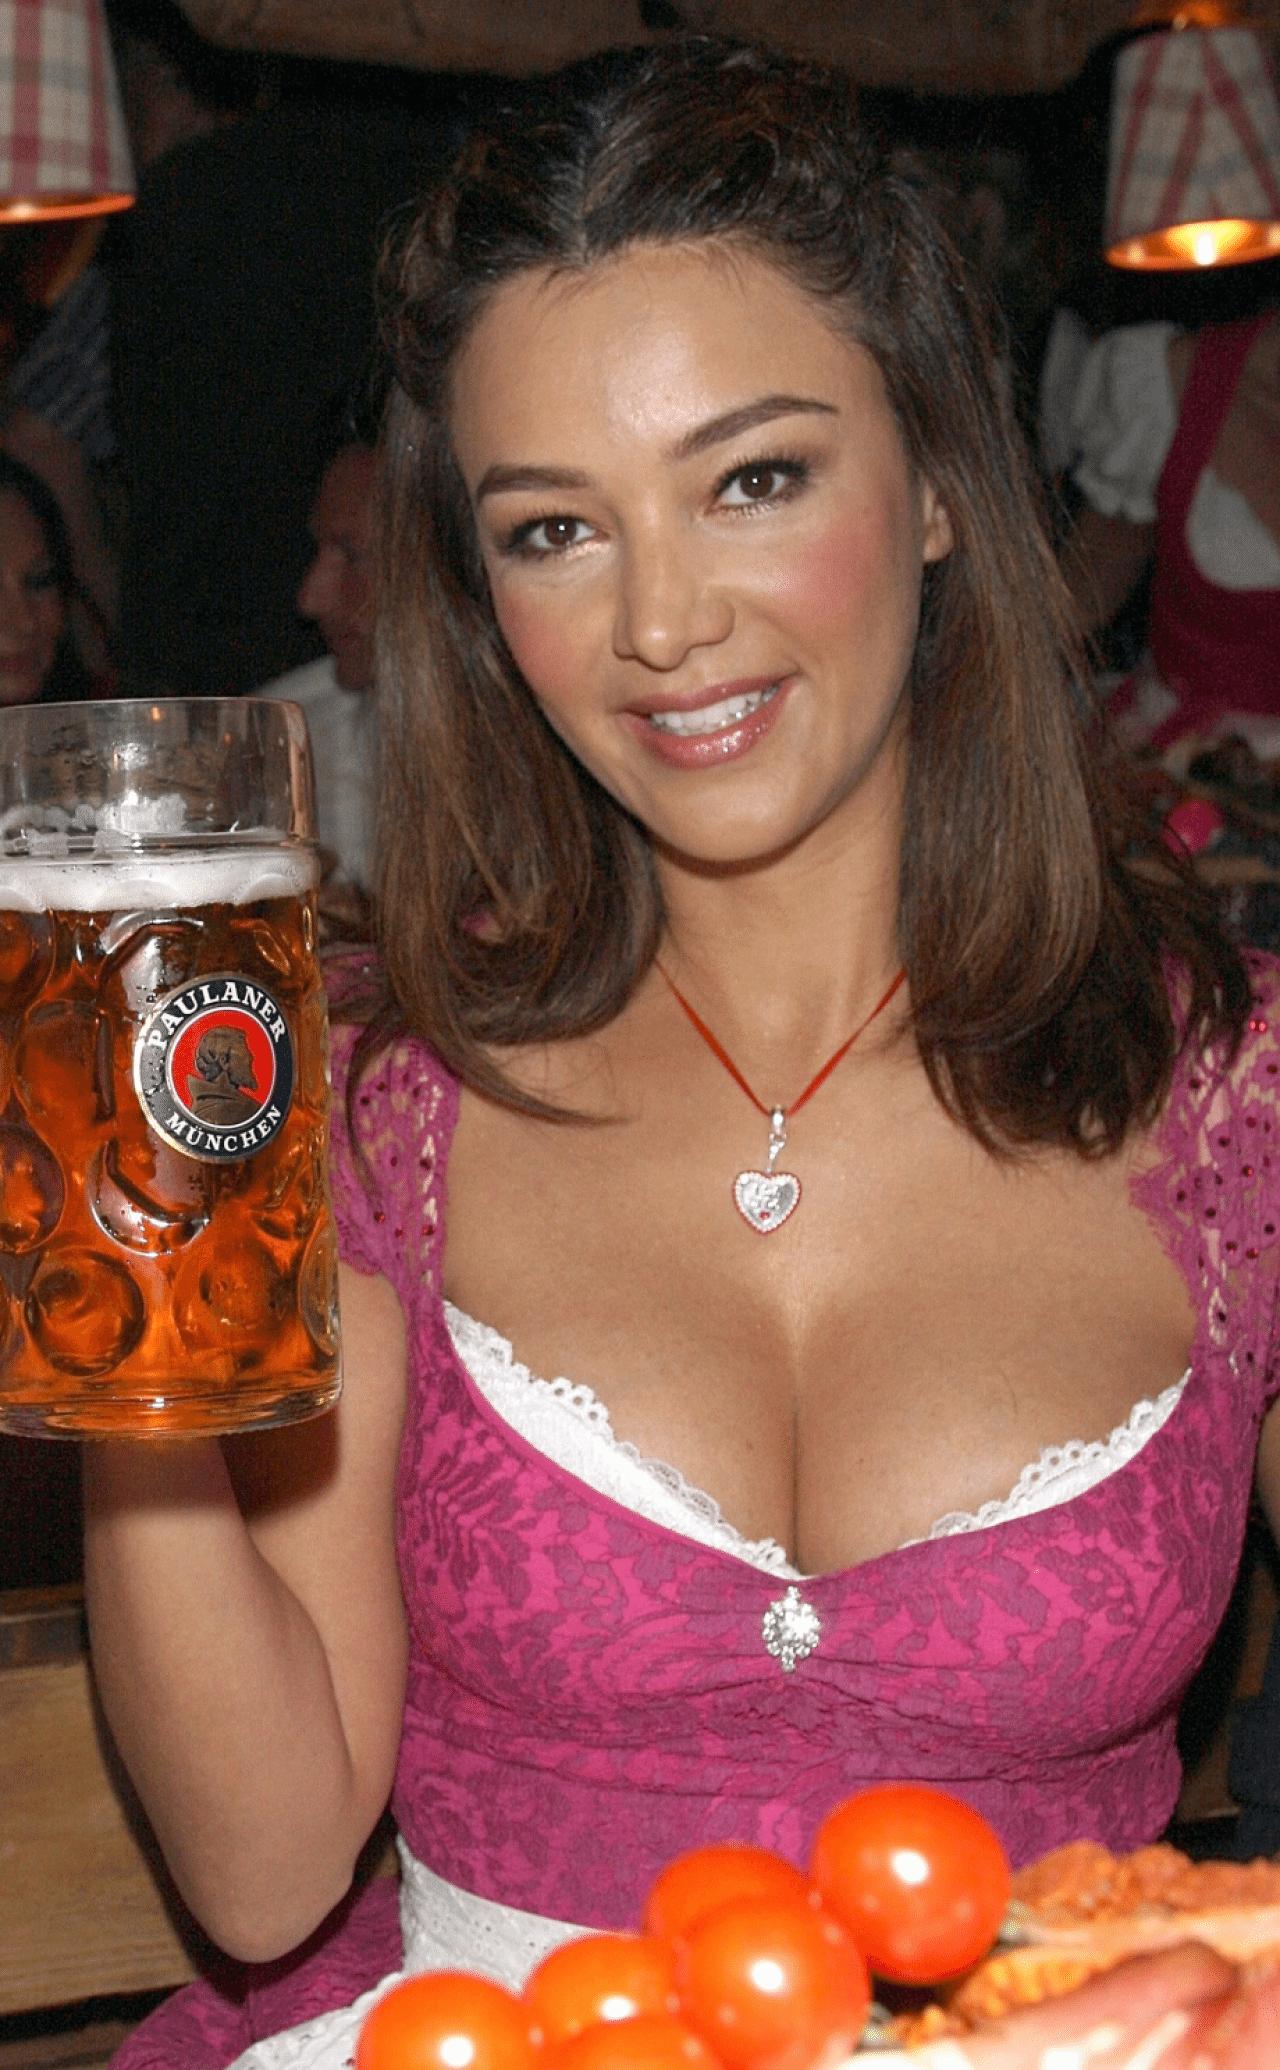 myanmar-beer-pussy-girls-spanking-wet-hard-ass-wife